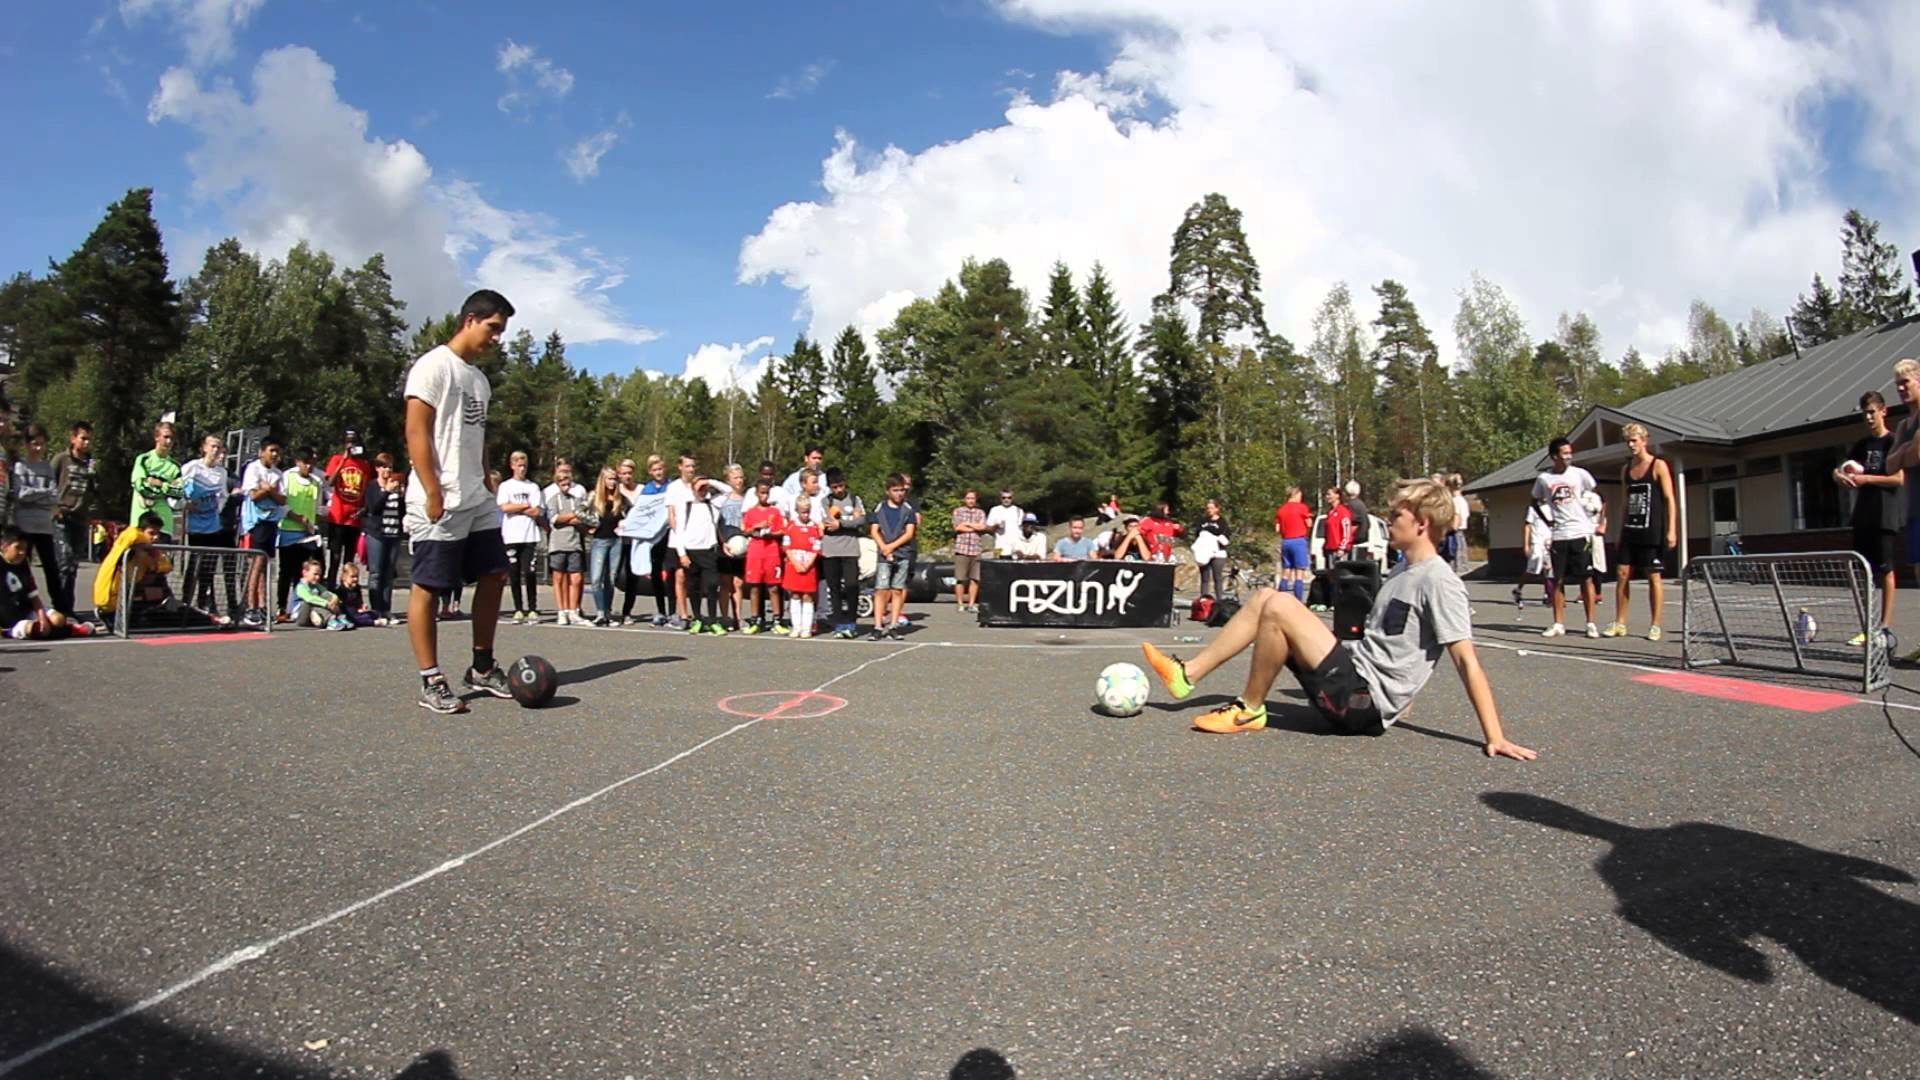 Azun Challenge 2014 – Cristian vs Jørgen